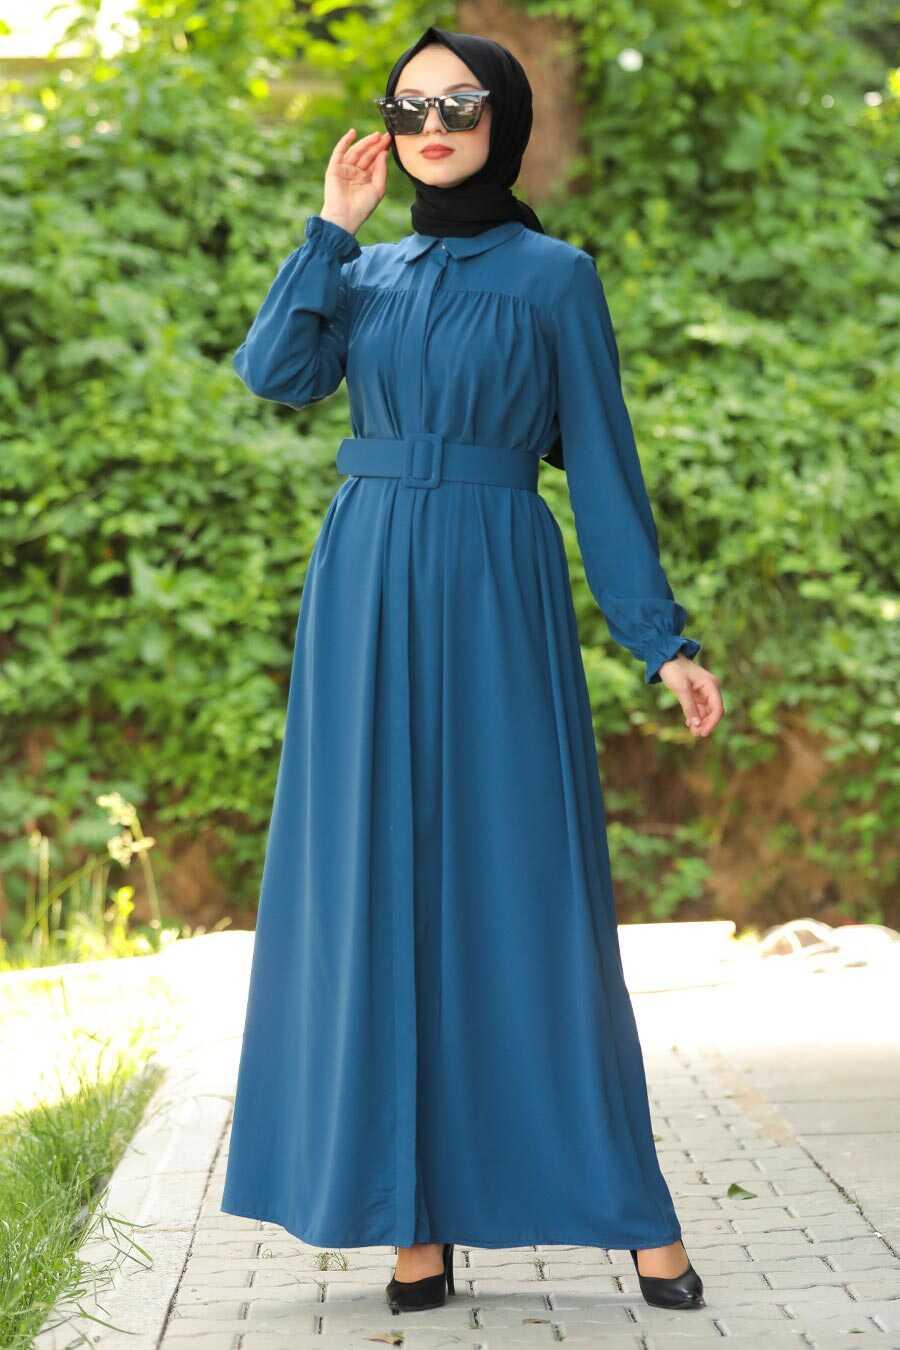 İndigo Blue Hijab Daily Dress 12580IM